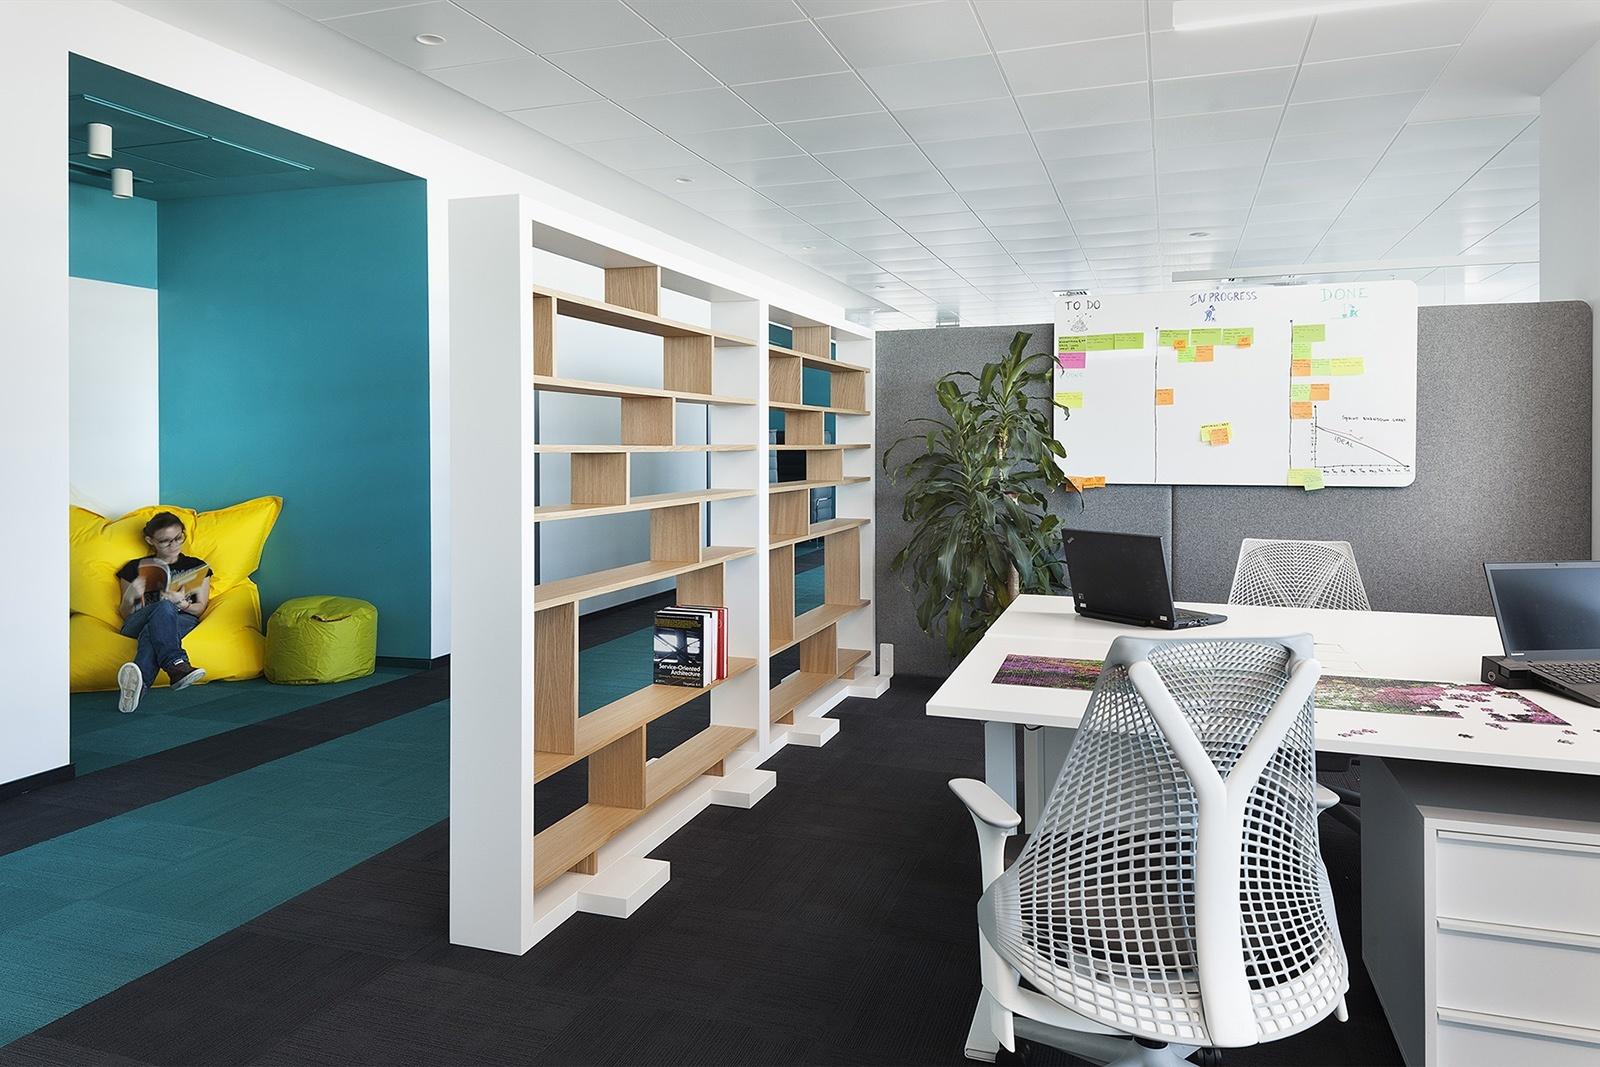 Paysafe-office-developers-cache atelier-Sofia-Bulgaria-13-team unit  niche